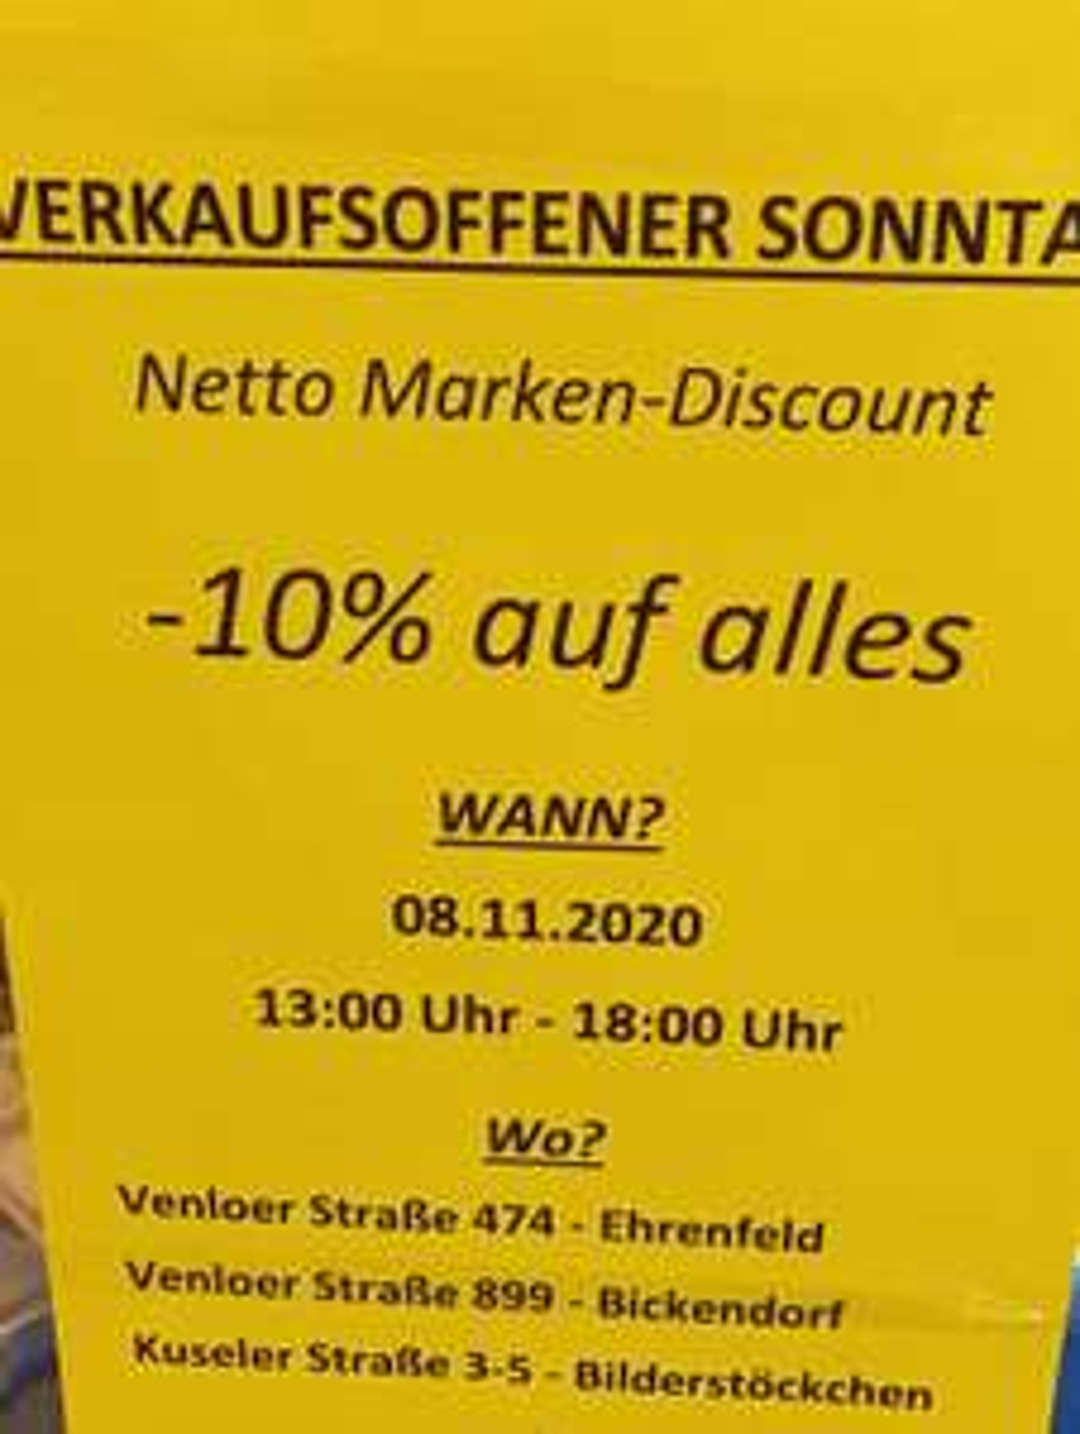 LOKAL Köln/Regensburg - [Netto MD] 10% auf alles, verkaufsoffener Sonntag